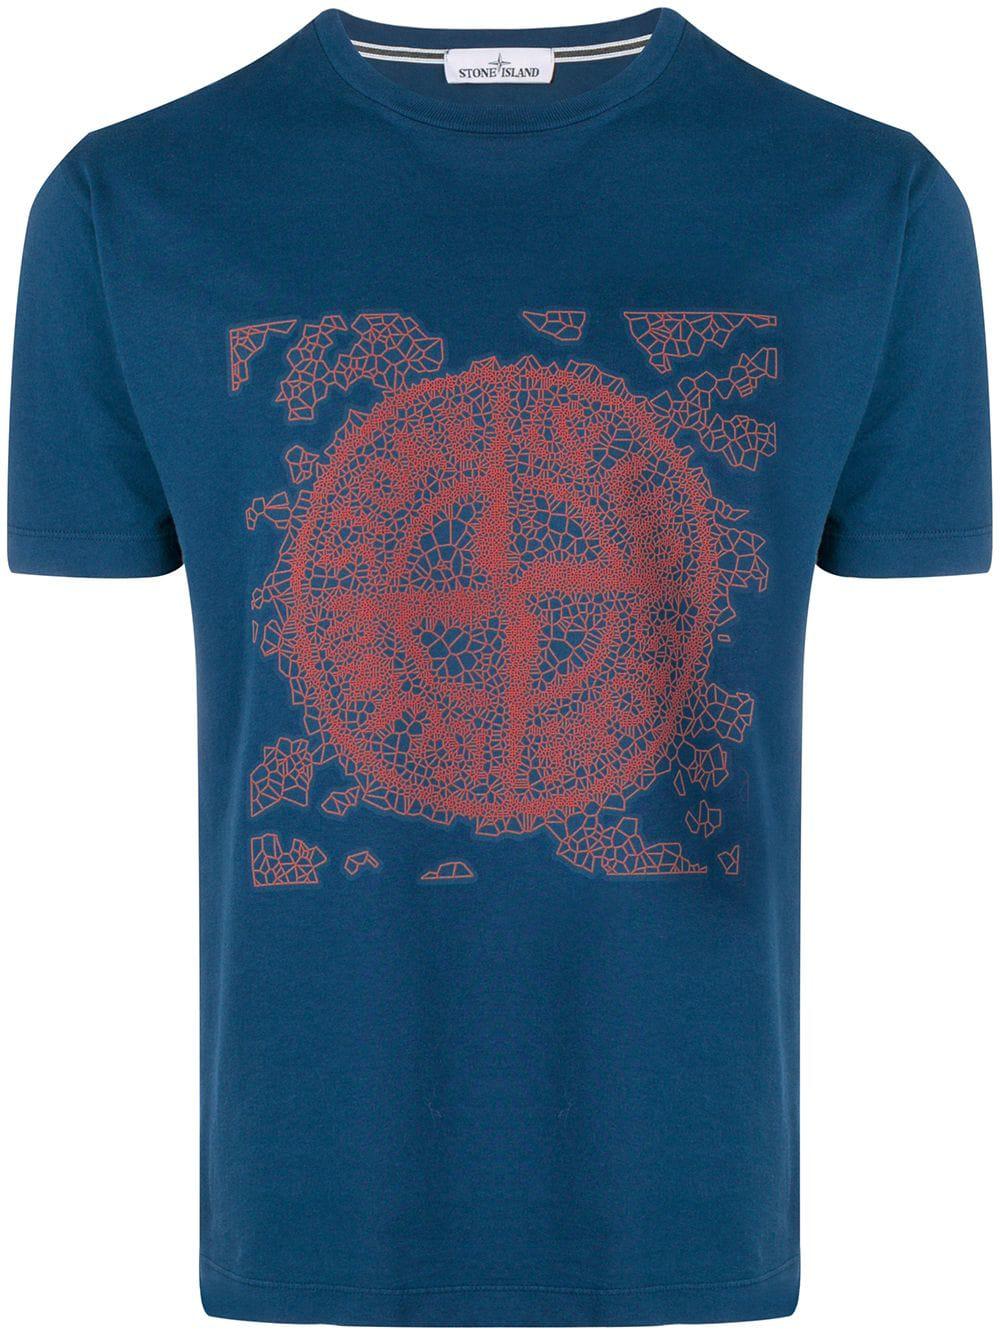 653e1e18da5 Stone Island T-Shirt Mit Logo-Print - Blau In Blue